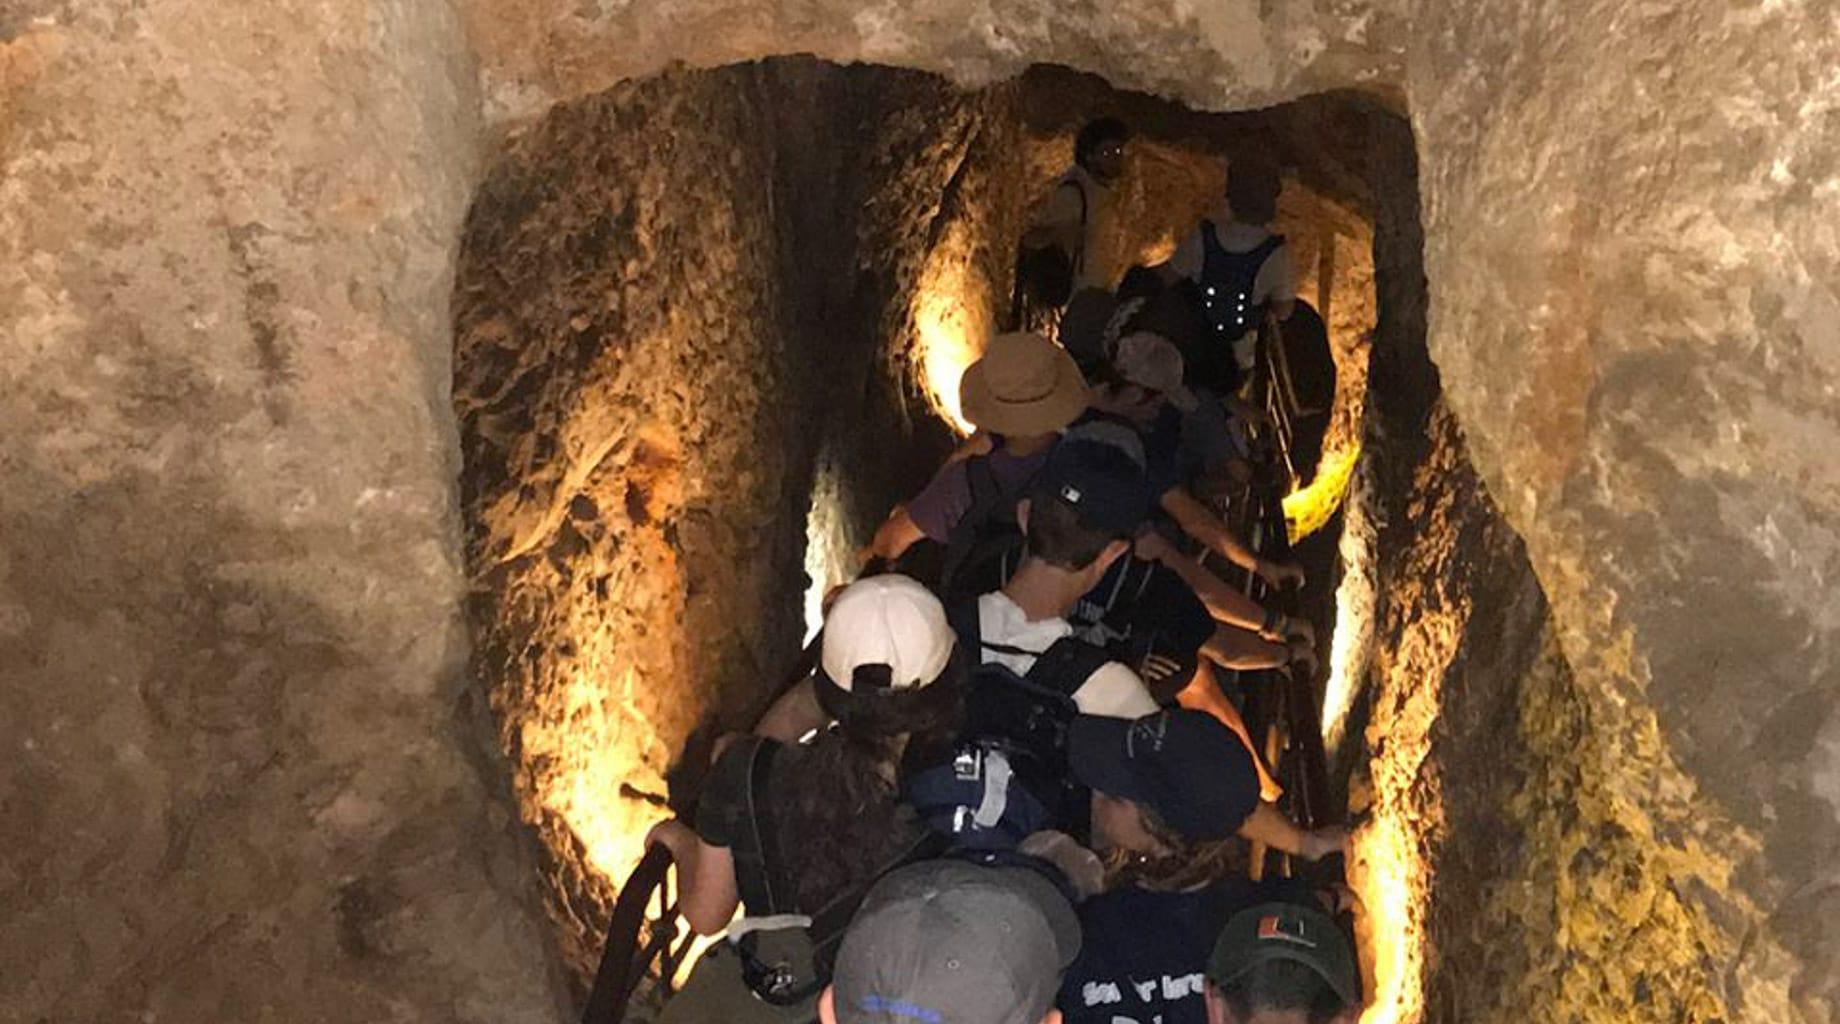 Students exploring Israeli caves